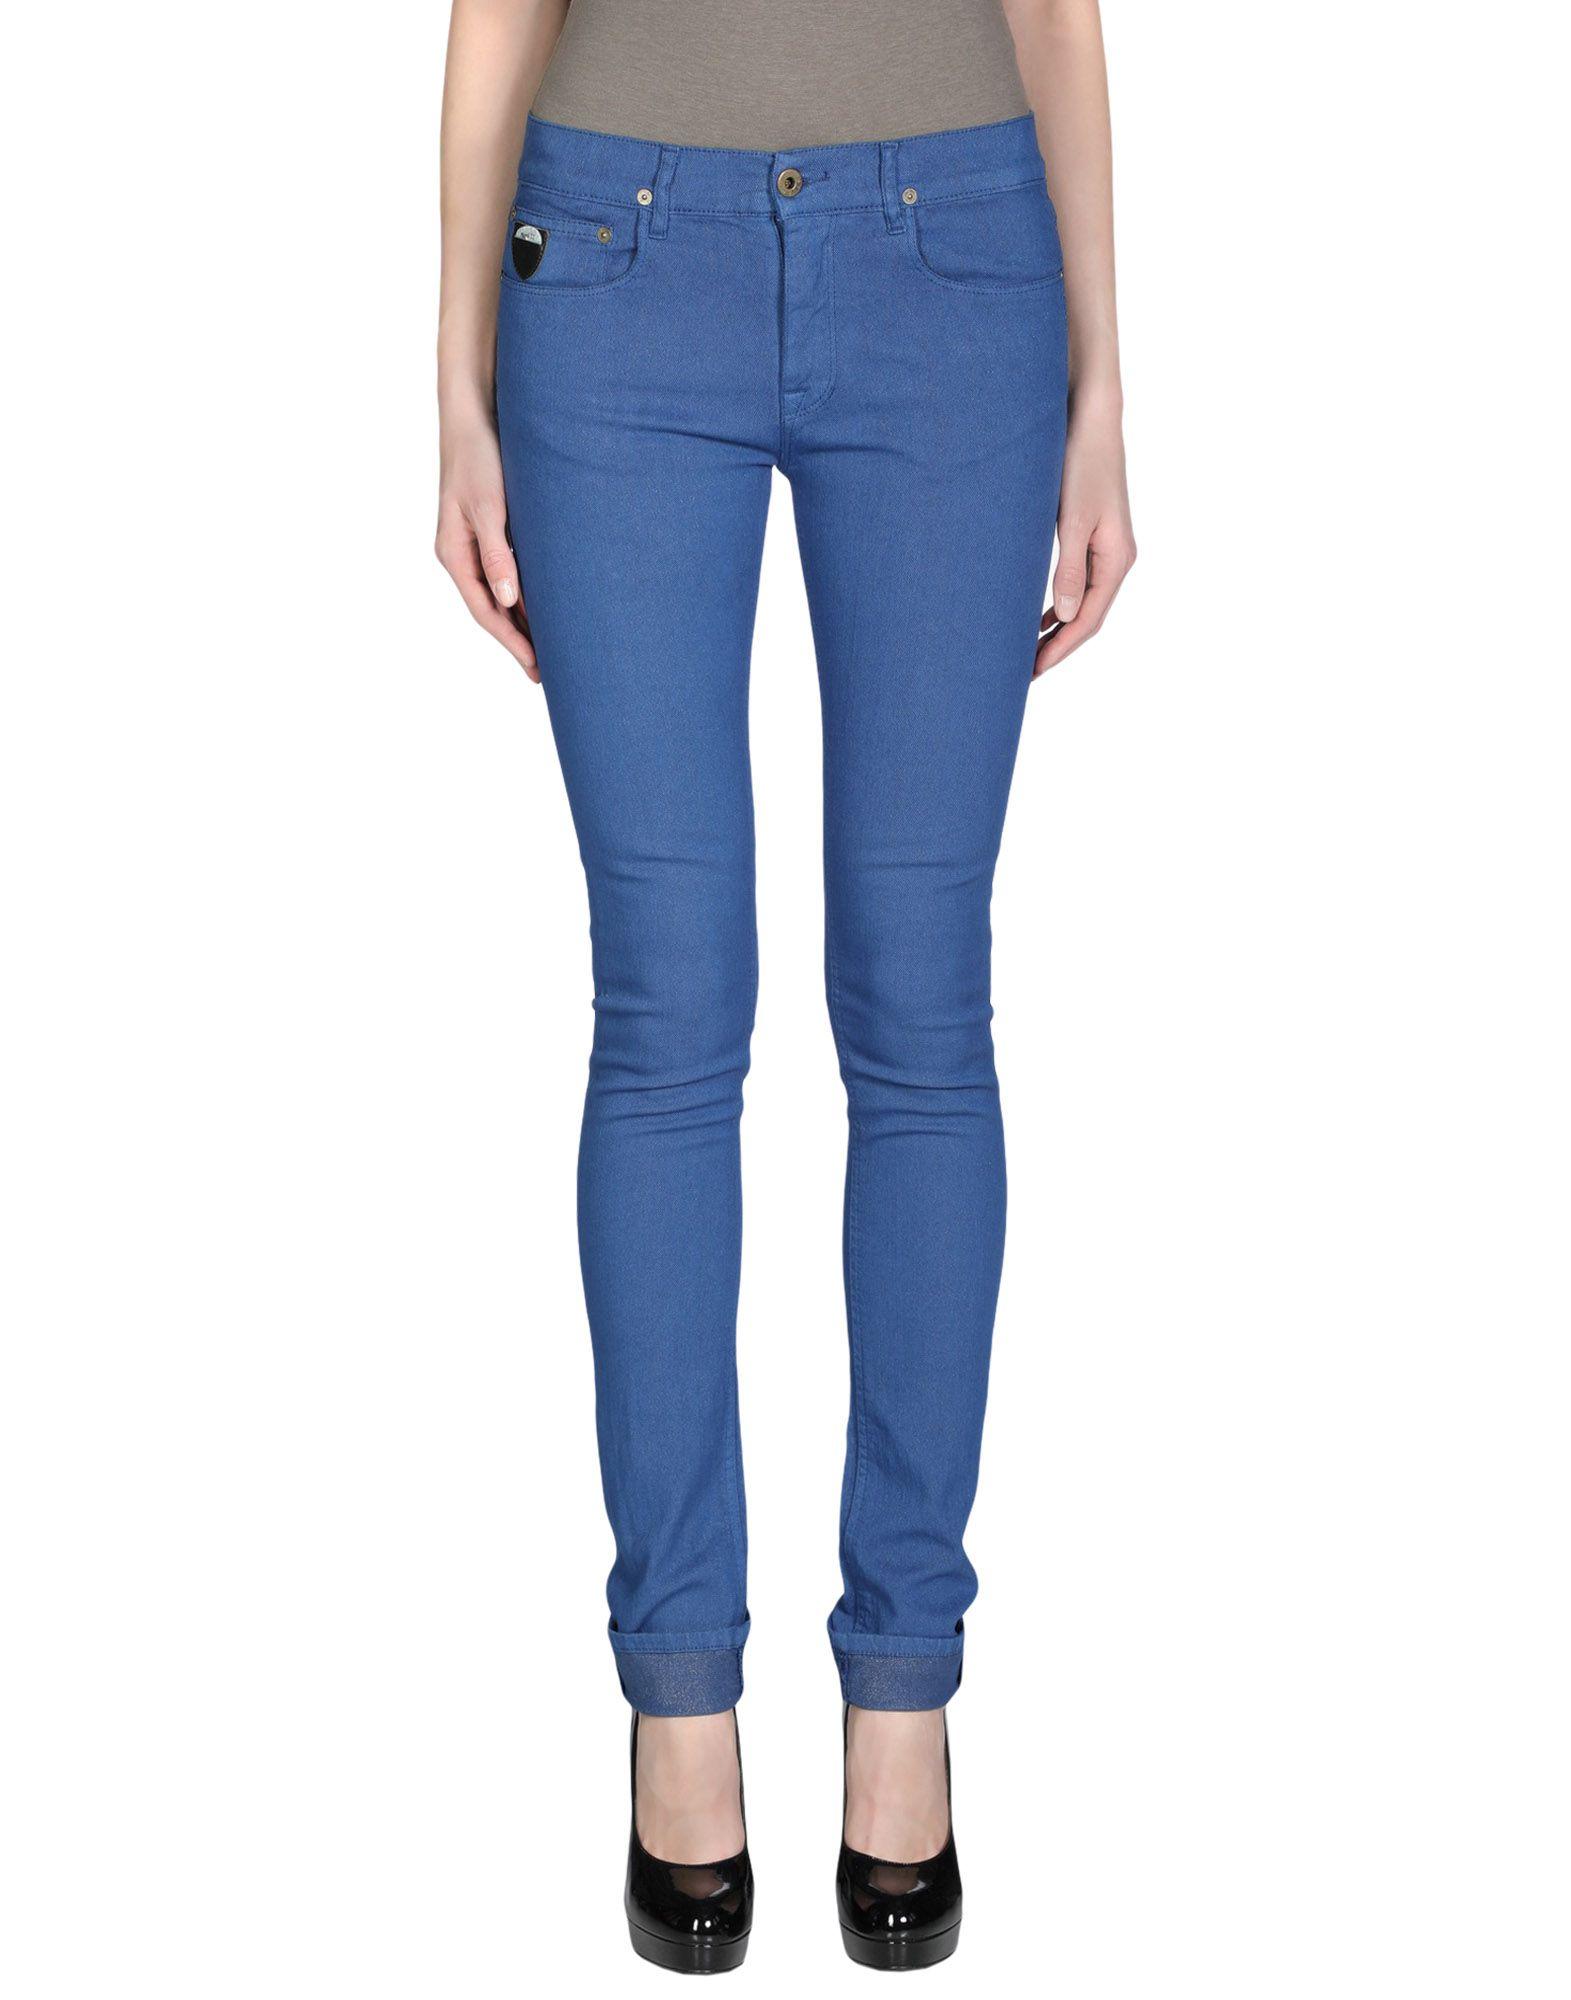 APRIL77 Denim Pants in Blue